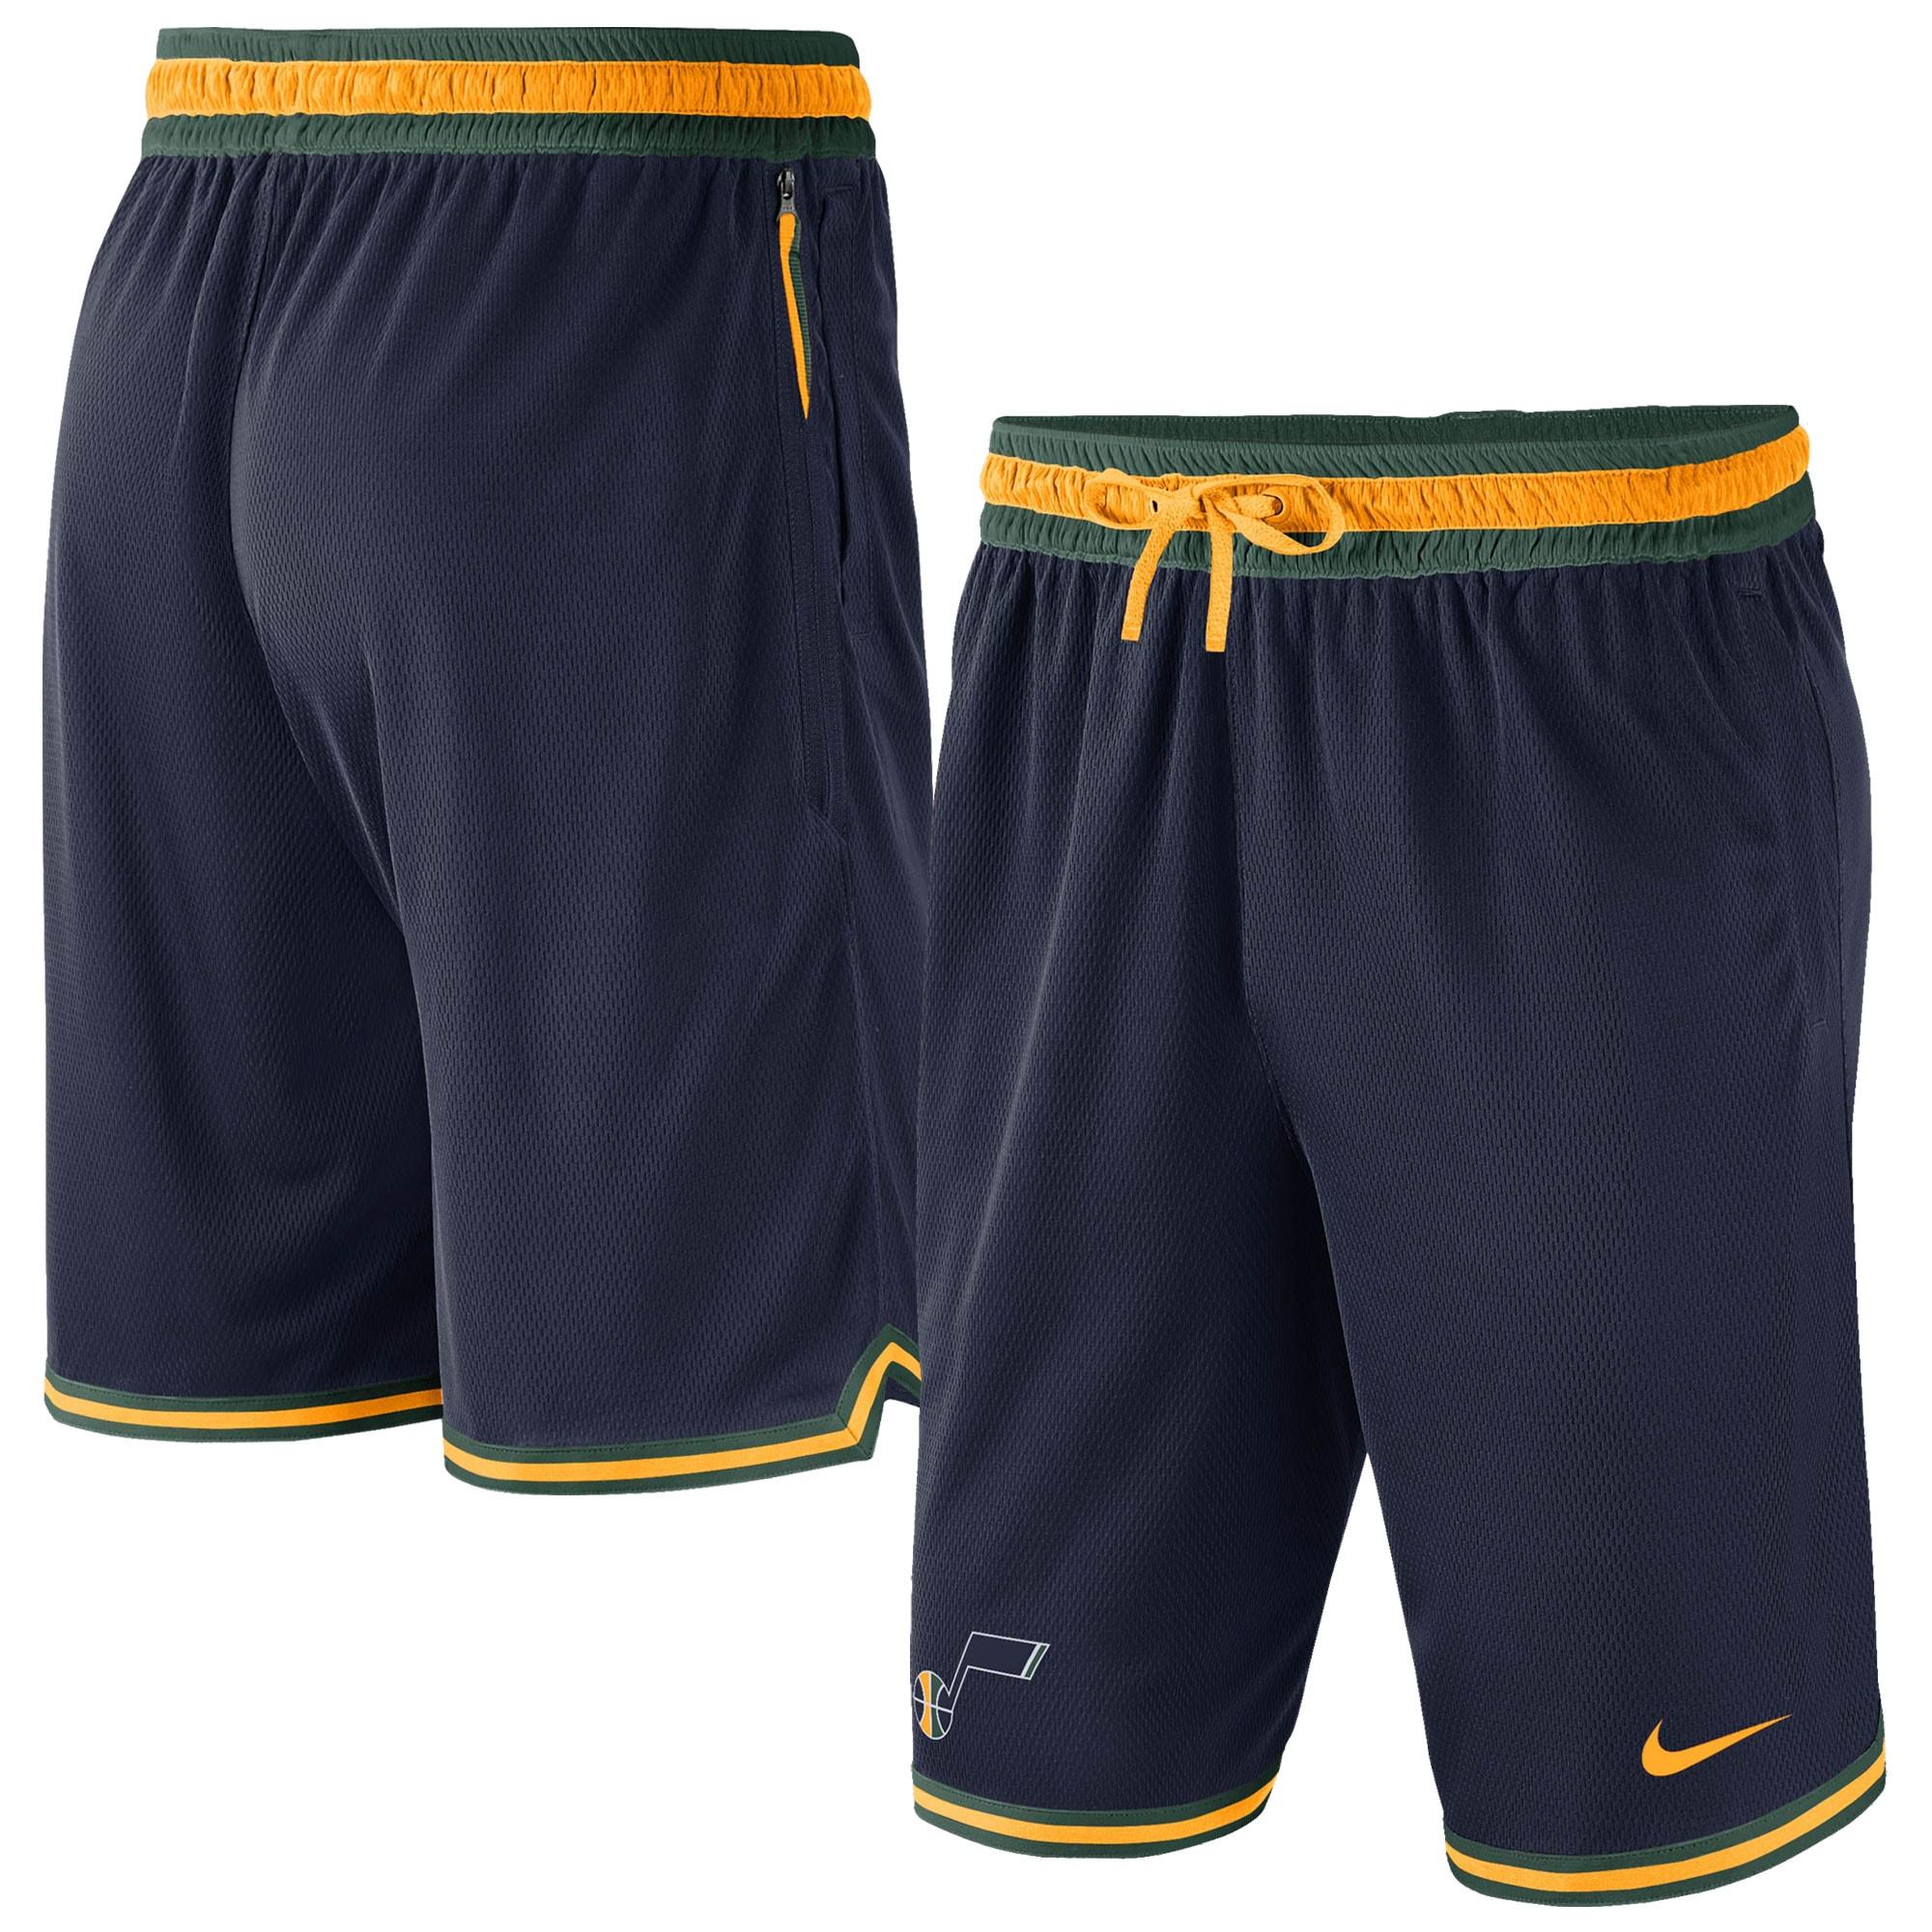 Utah Jazz Nike Heavyweight DNA Performance Shorts - Navy